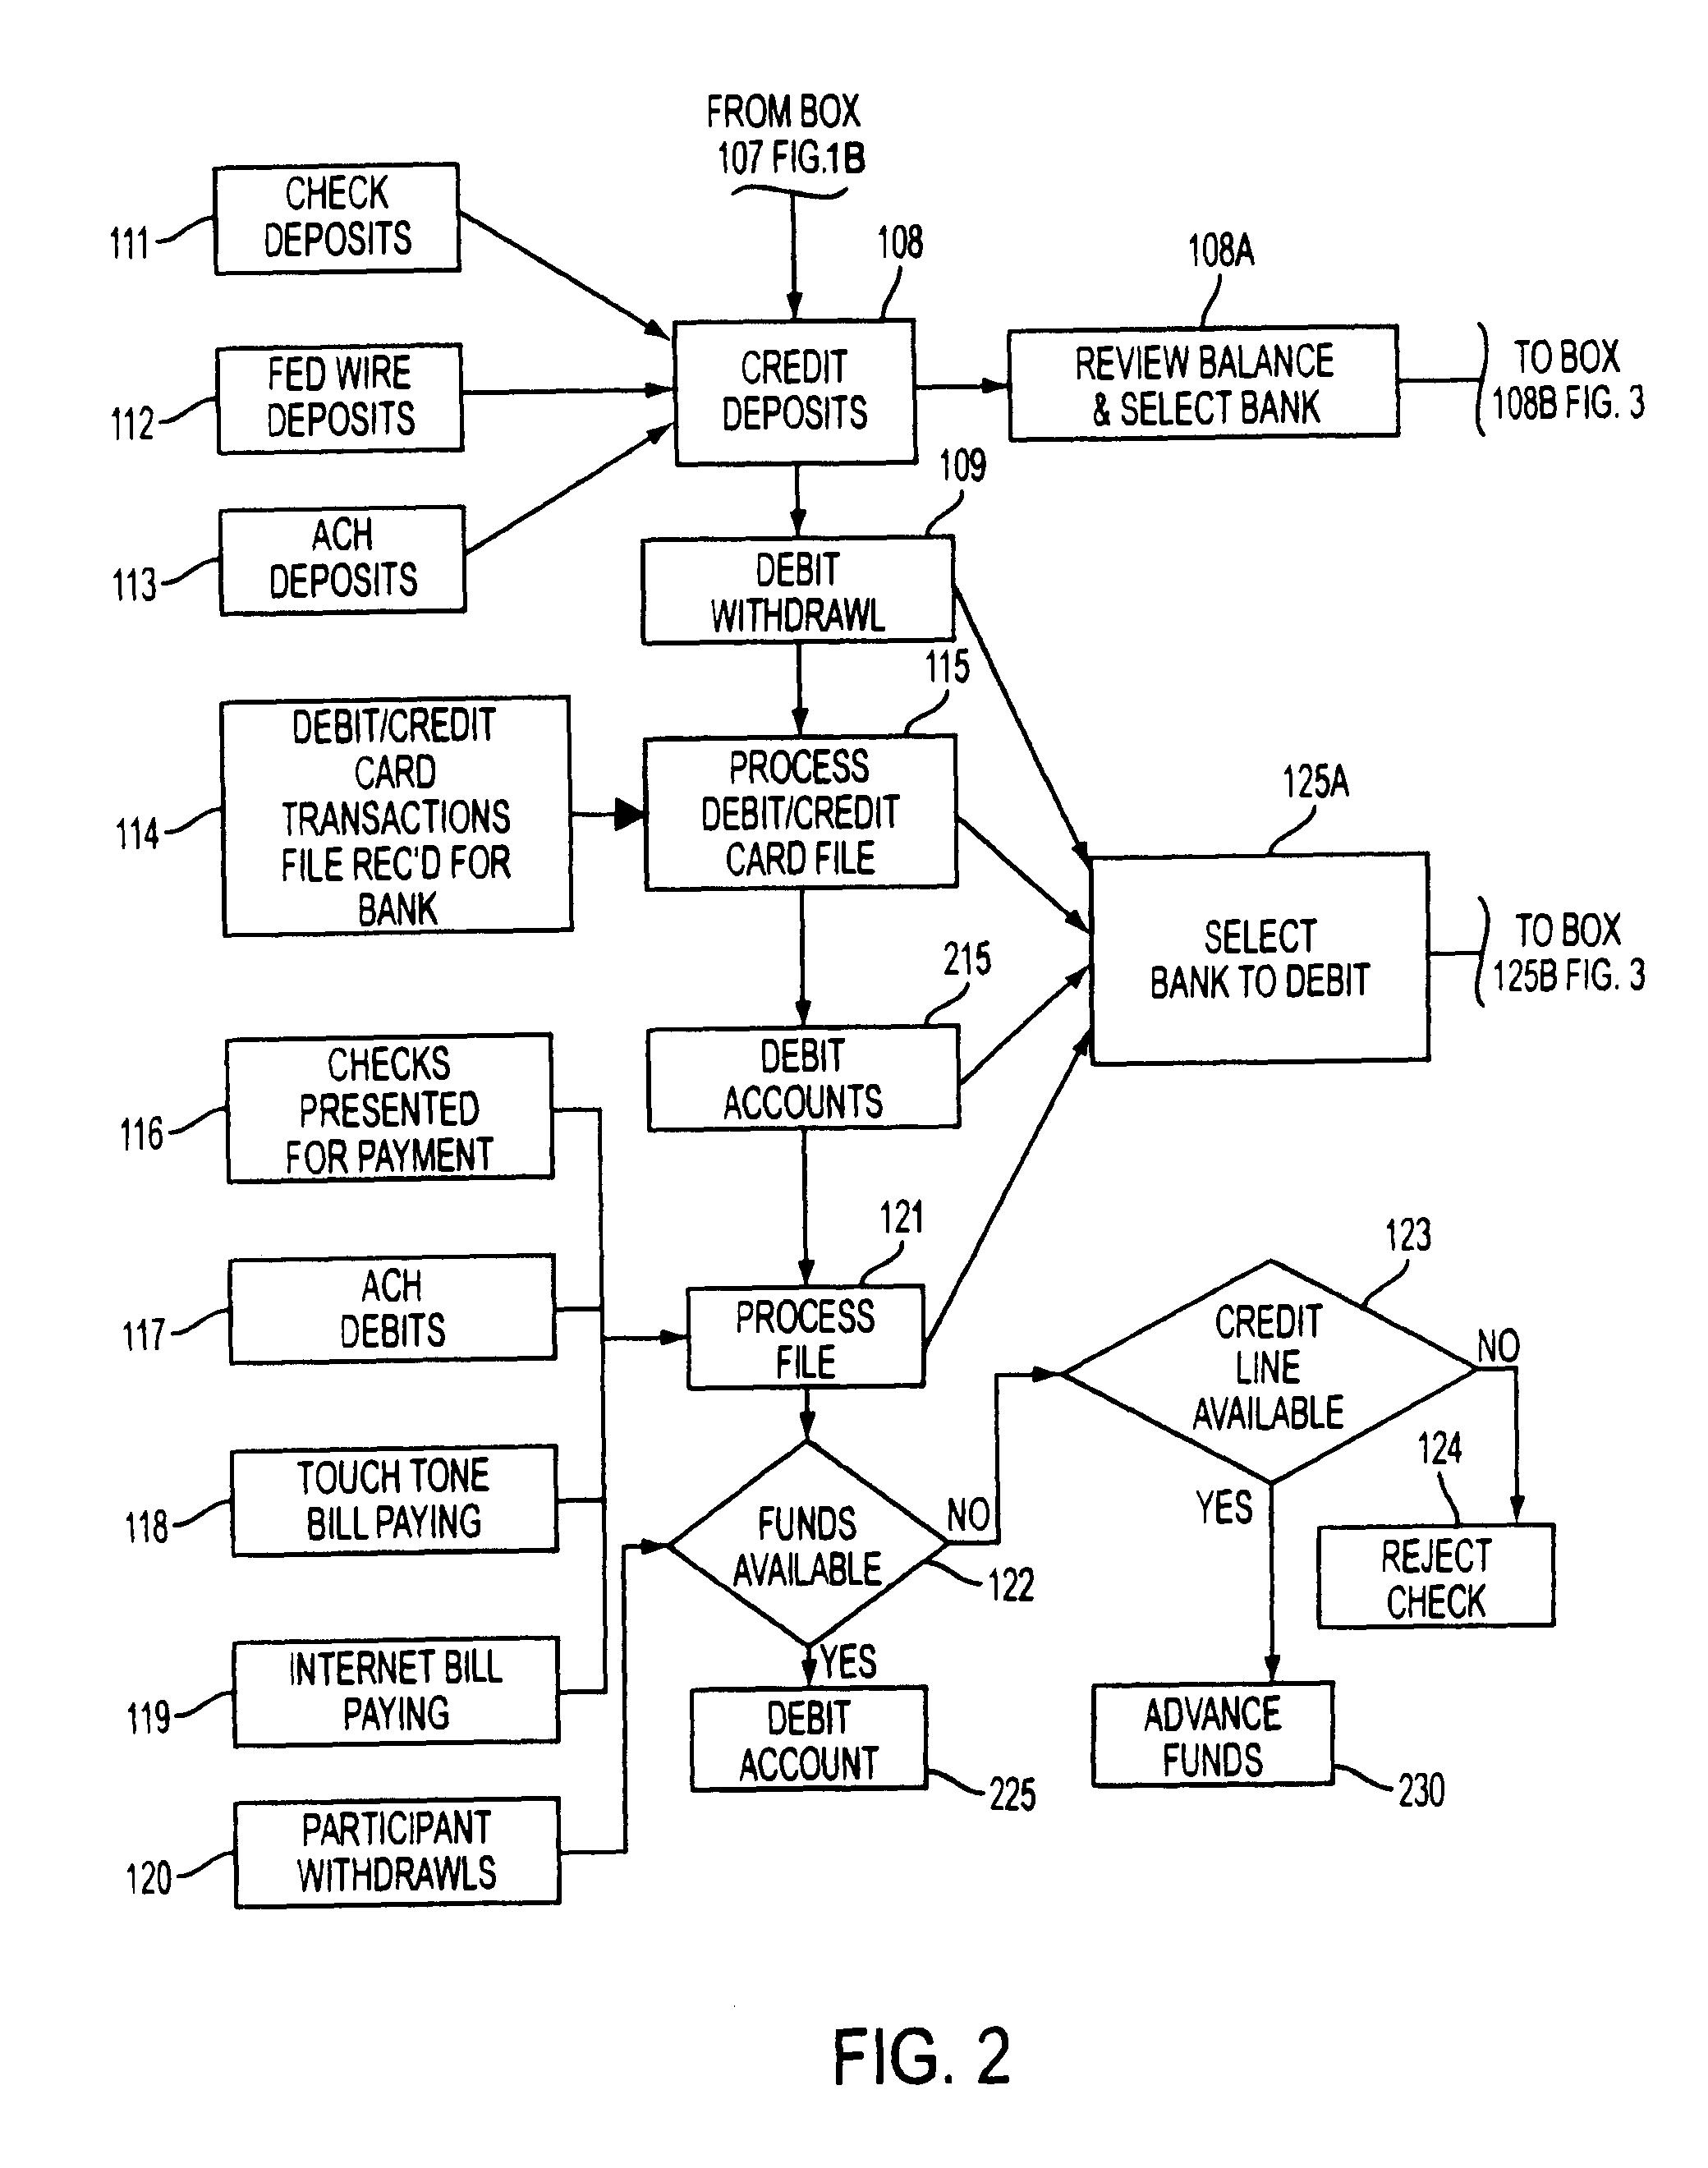 Wiring Diagram Honda Dax : Honda msx wiring diagram free engine image for